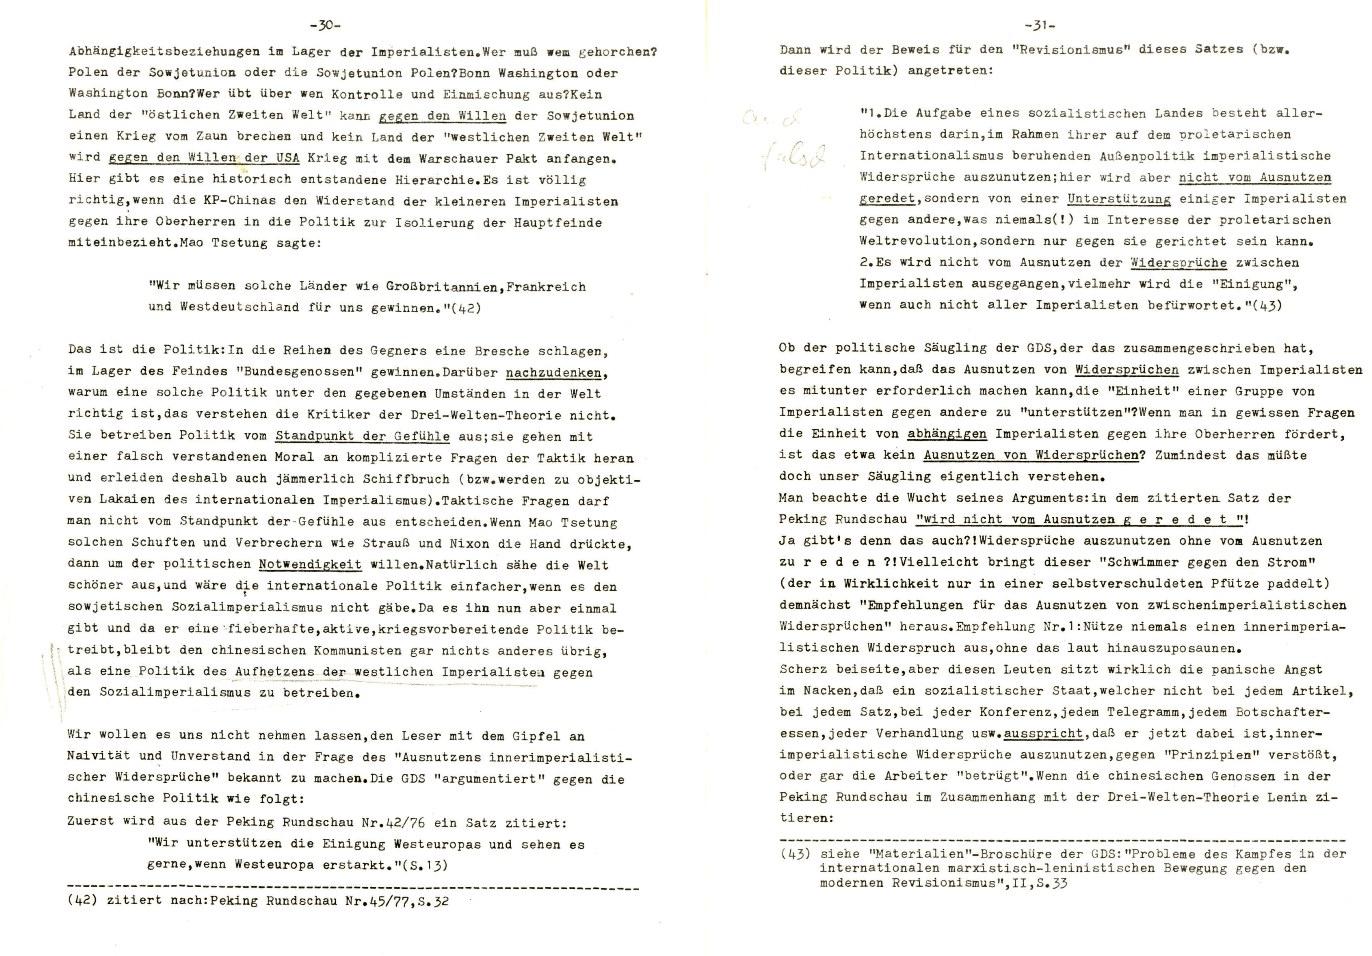 Muenchen_Kampf_dem_Revisionismus_1978_04_05_17